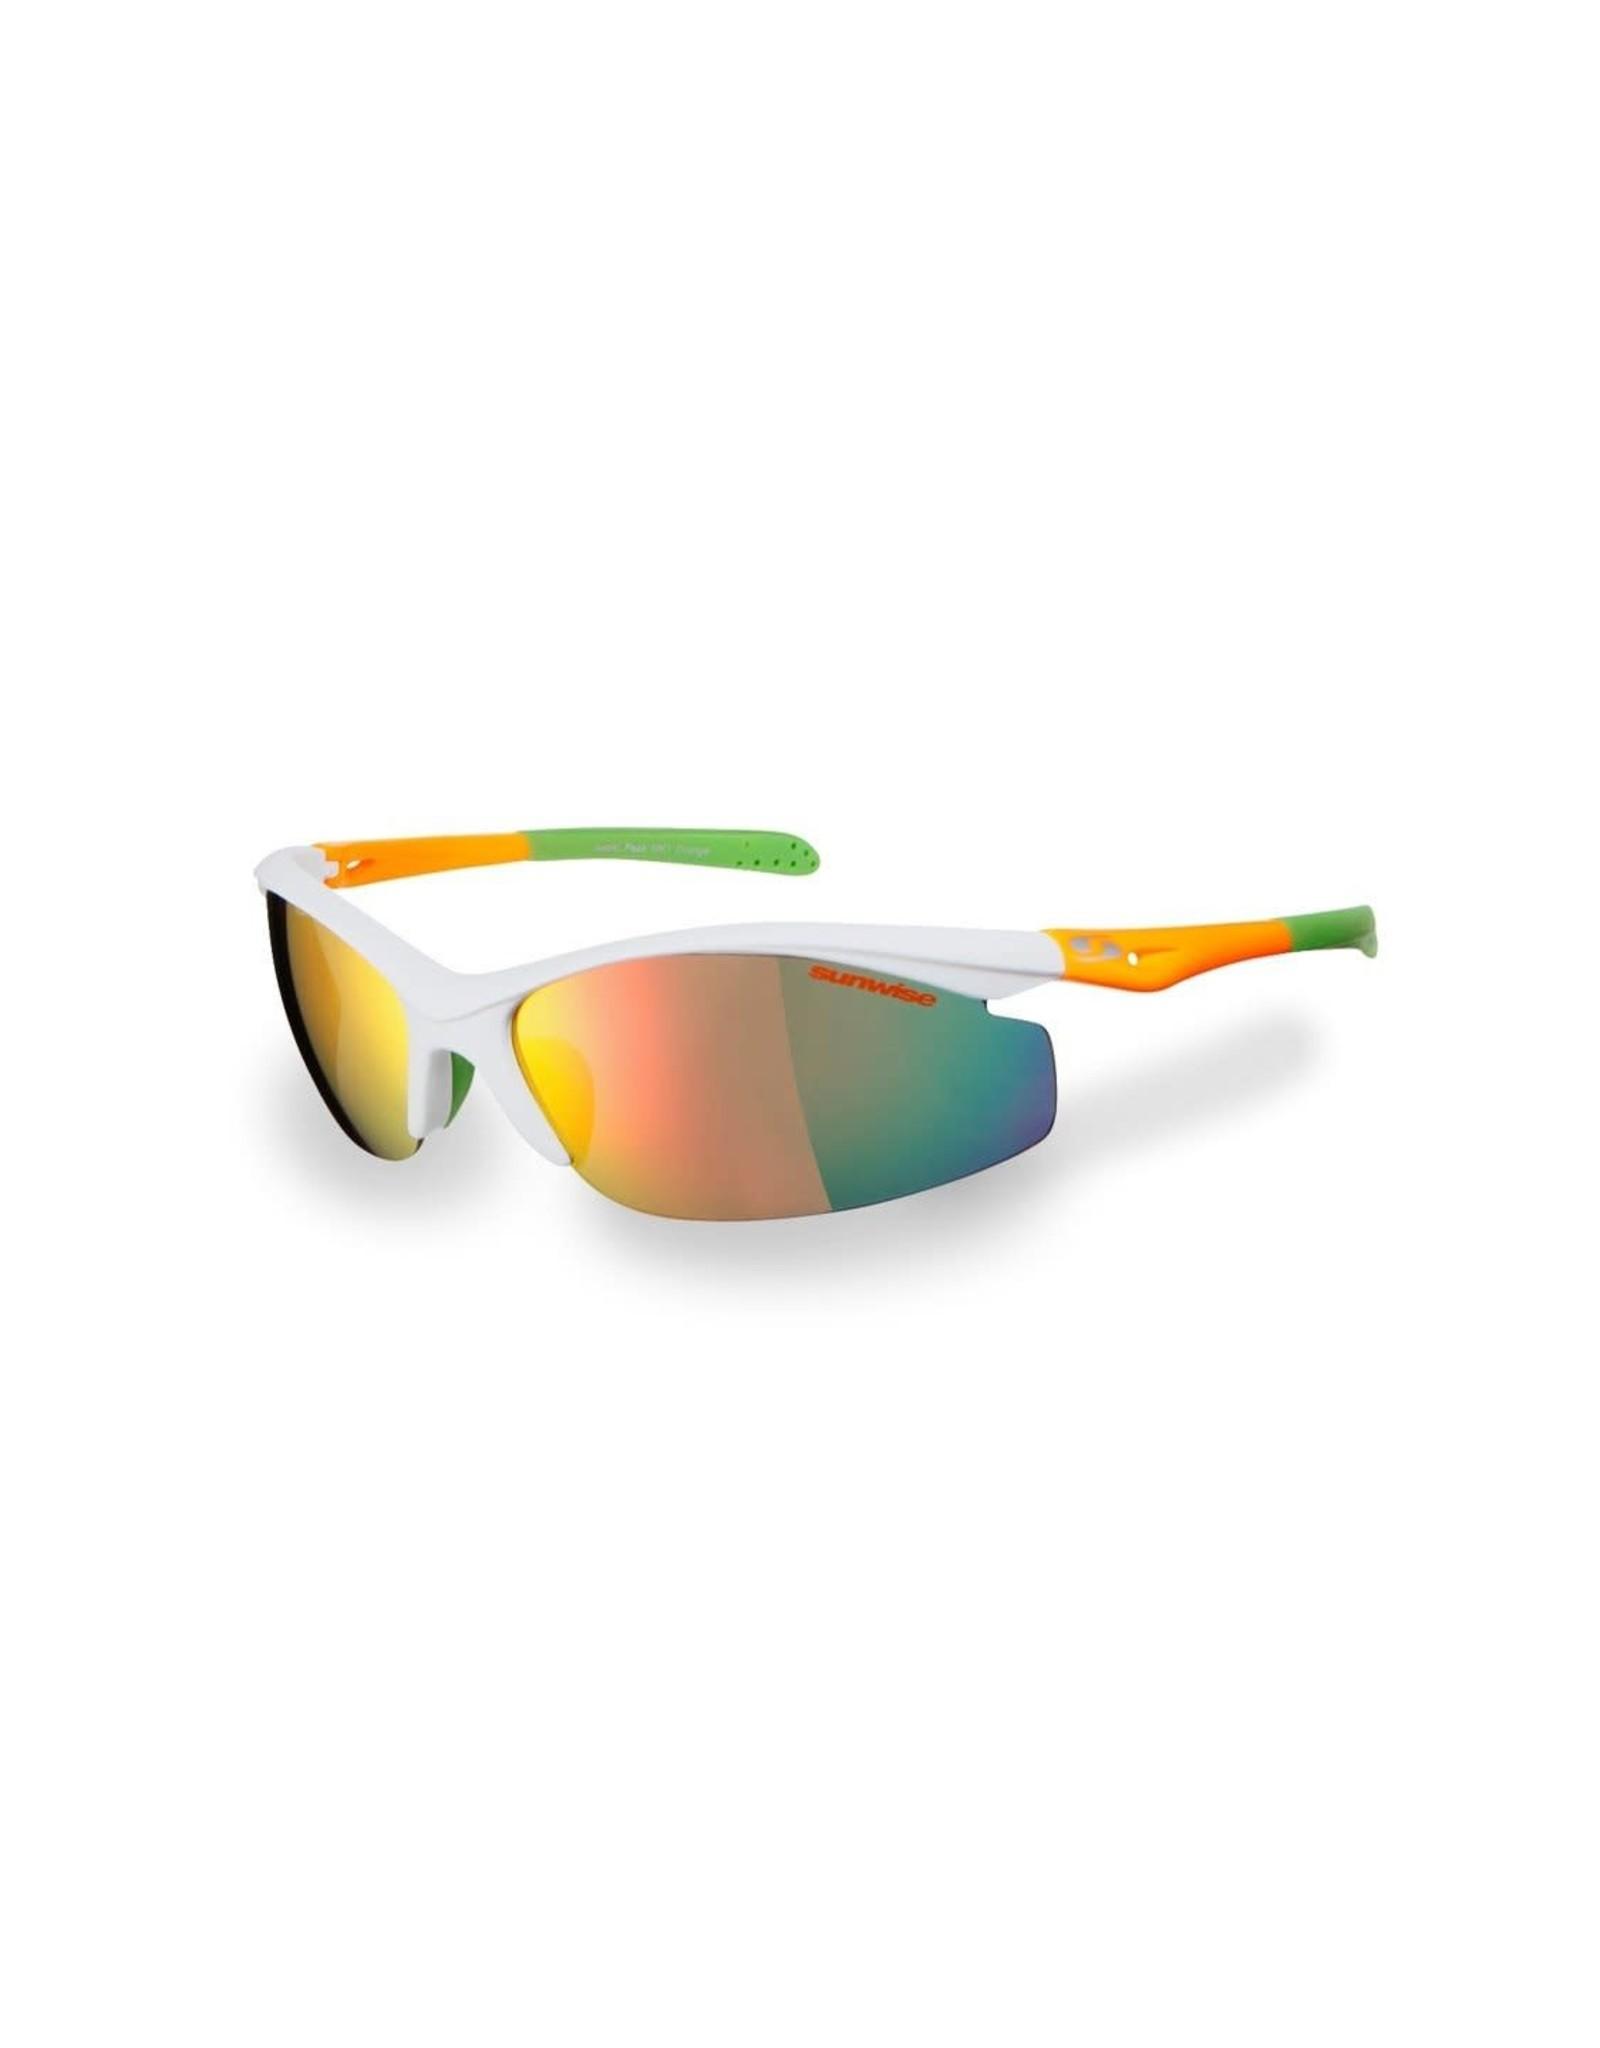 Sunwise Peak MK1 Cycling Sunglasses